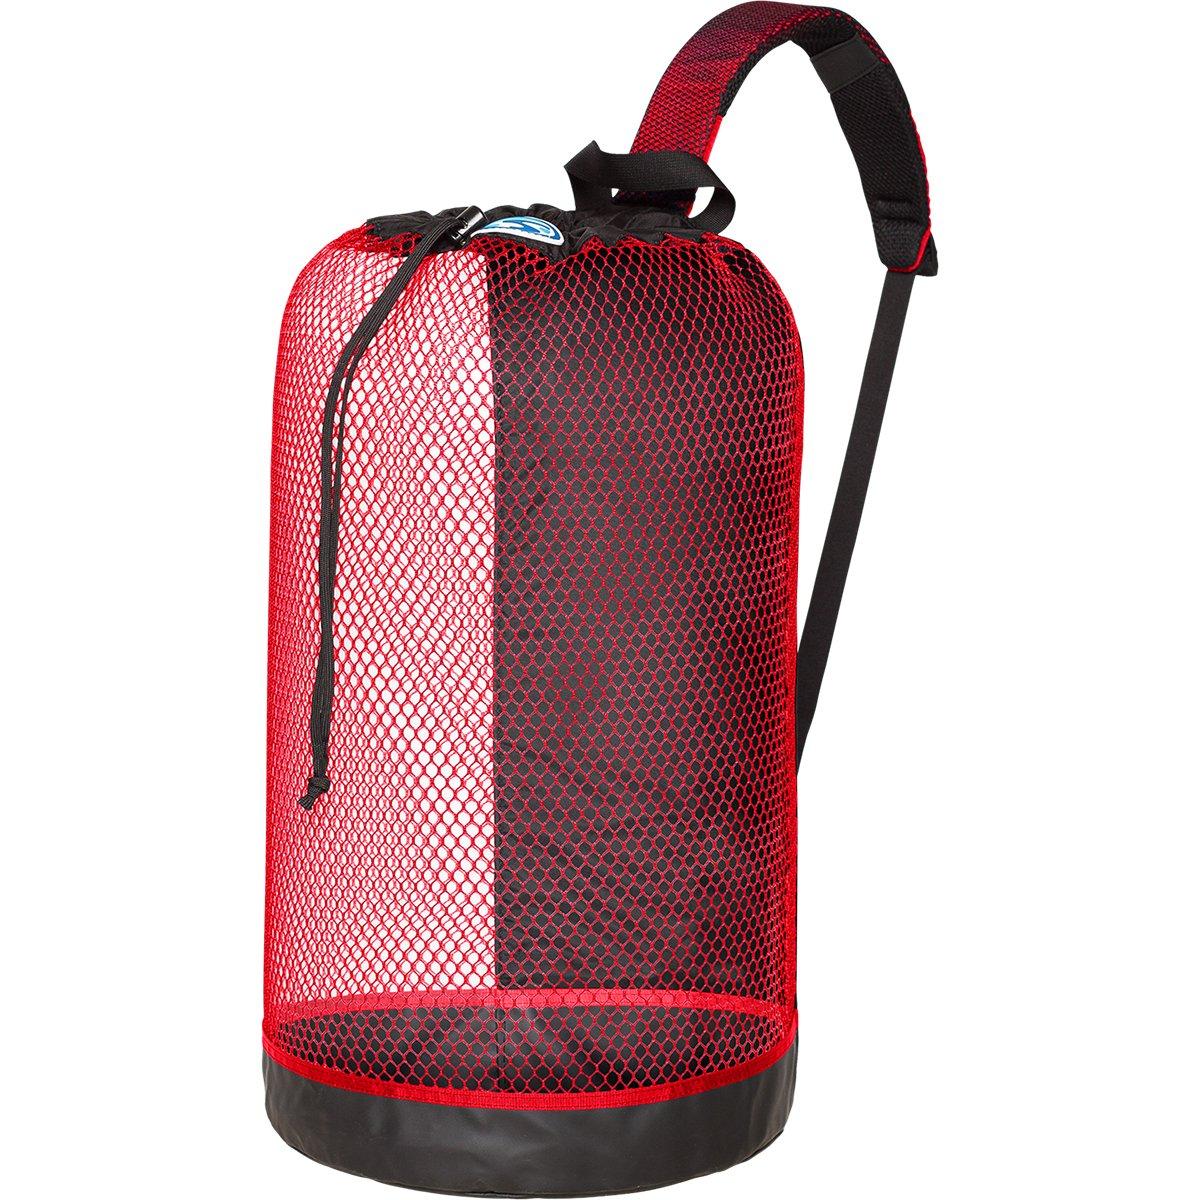 Stahlsac BVI Mesh Backpack